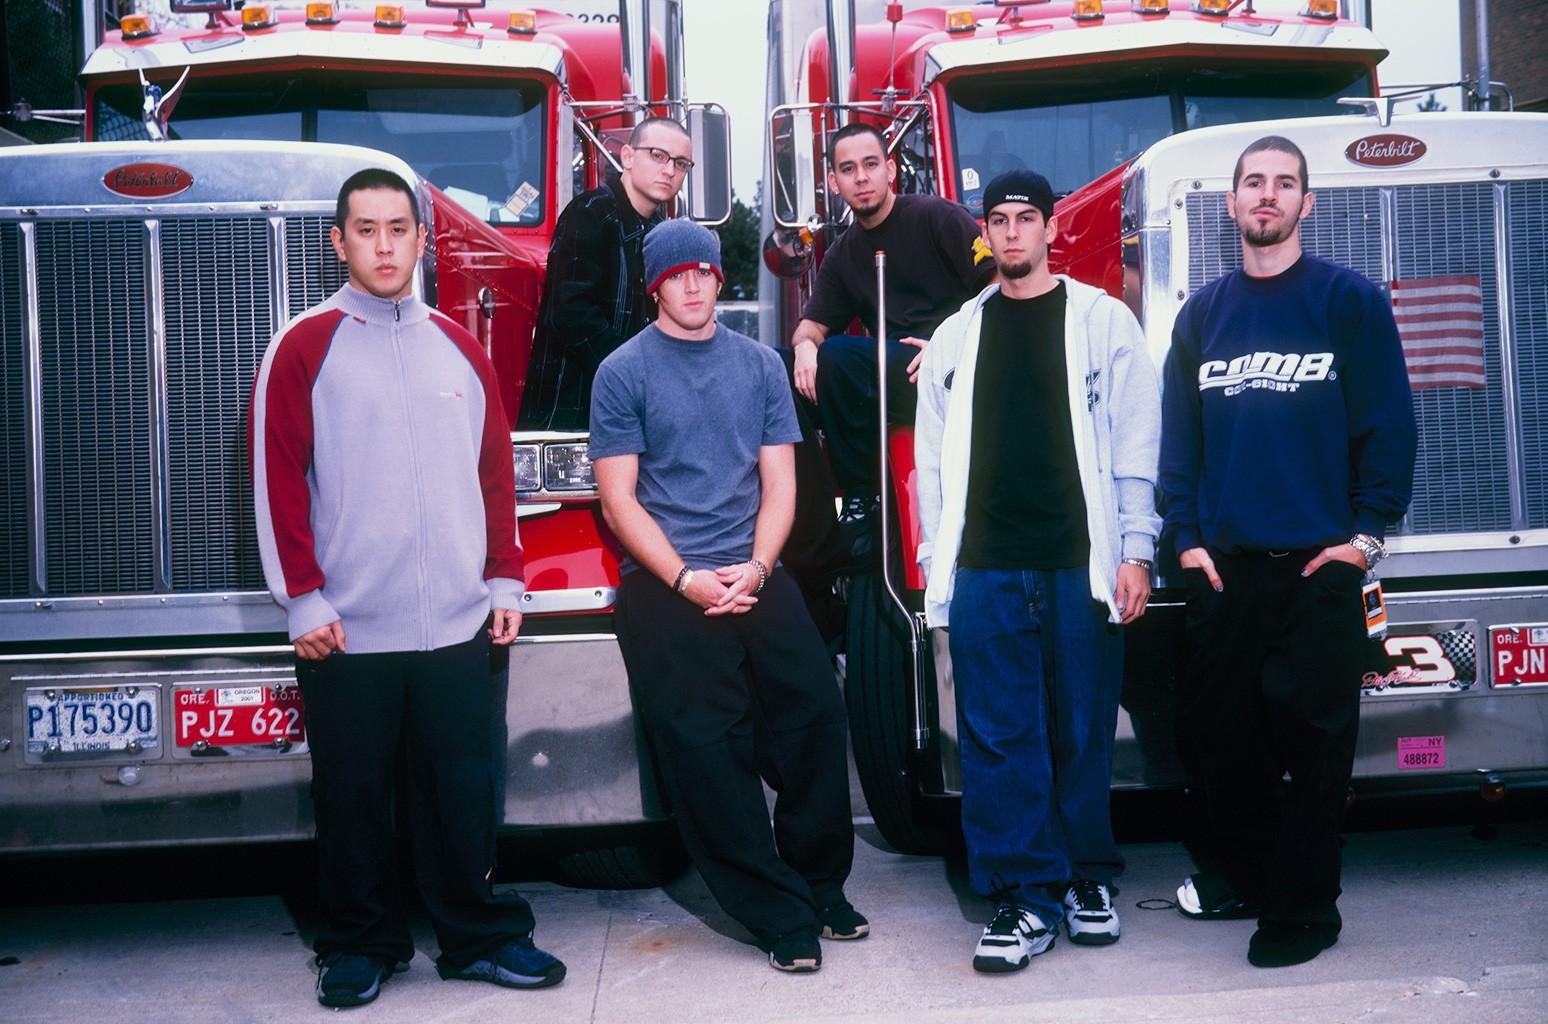 Joe Hahn, Chester Bennington, David 'Phoenix' Farrell, Mike Shinoda, Rob Bourdon and Brad Delson of Linkin Park in 2001.